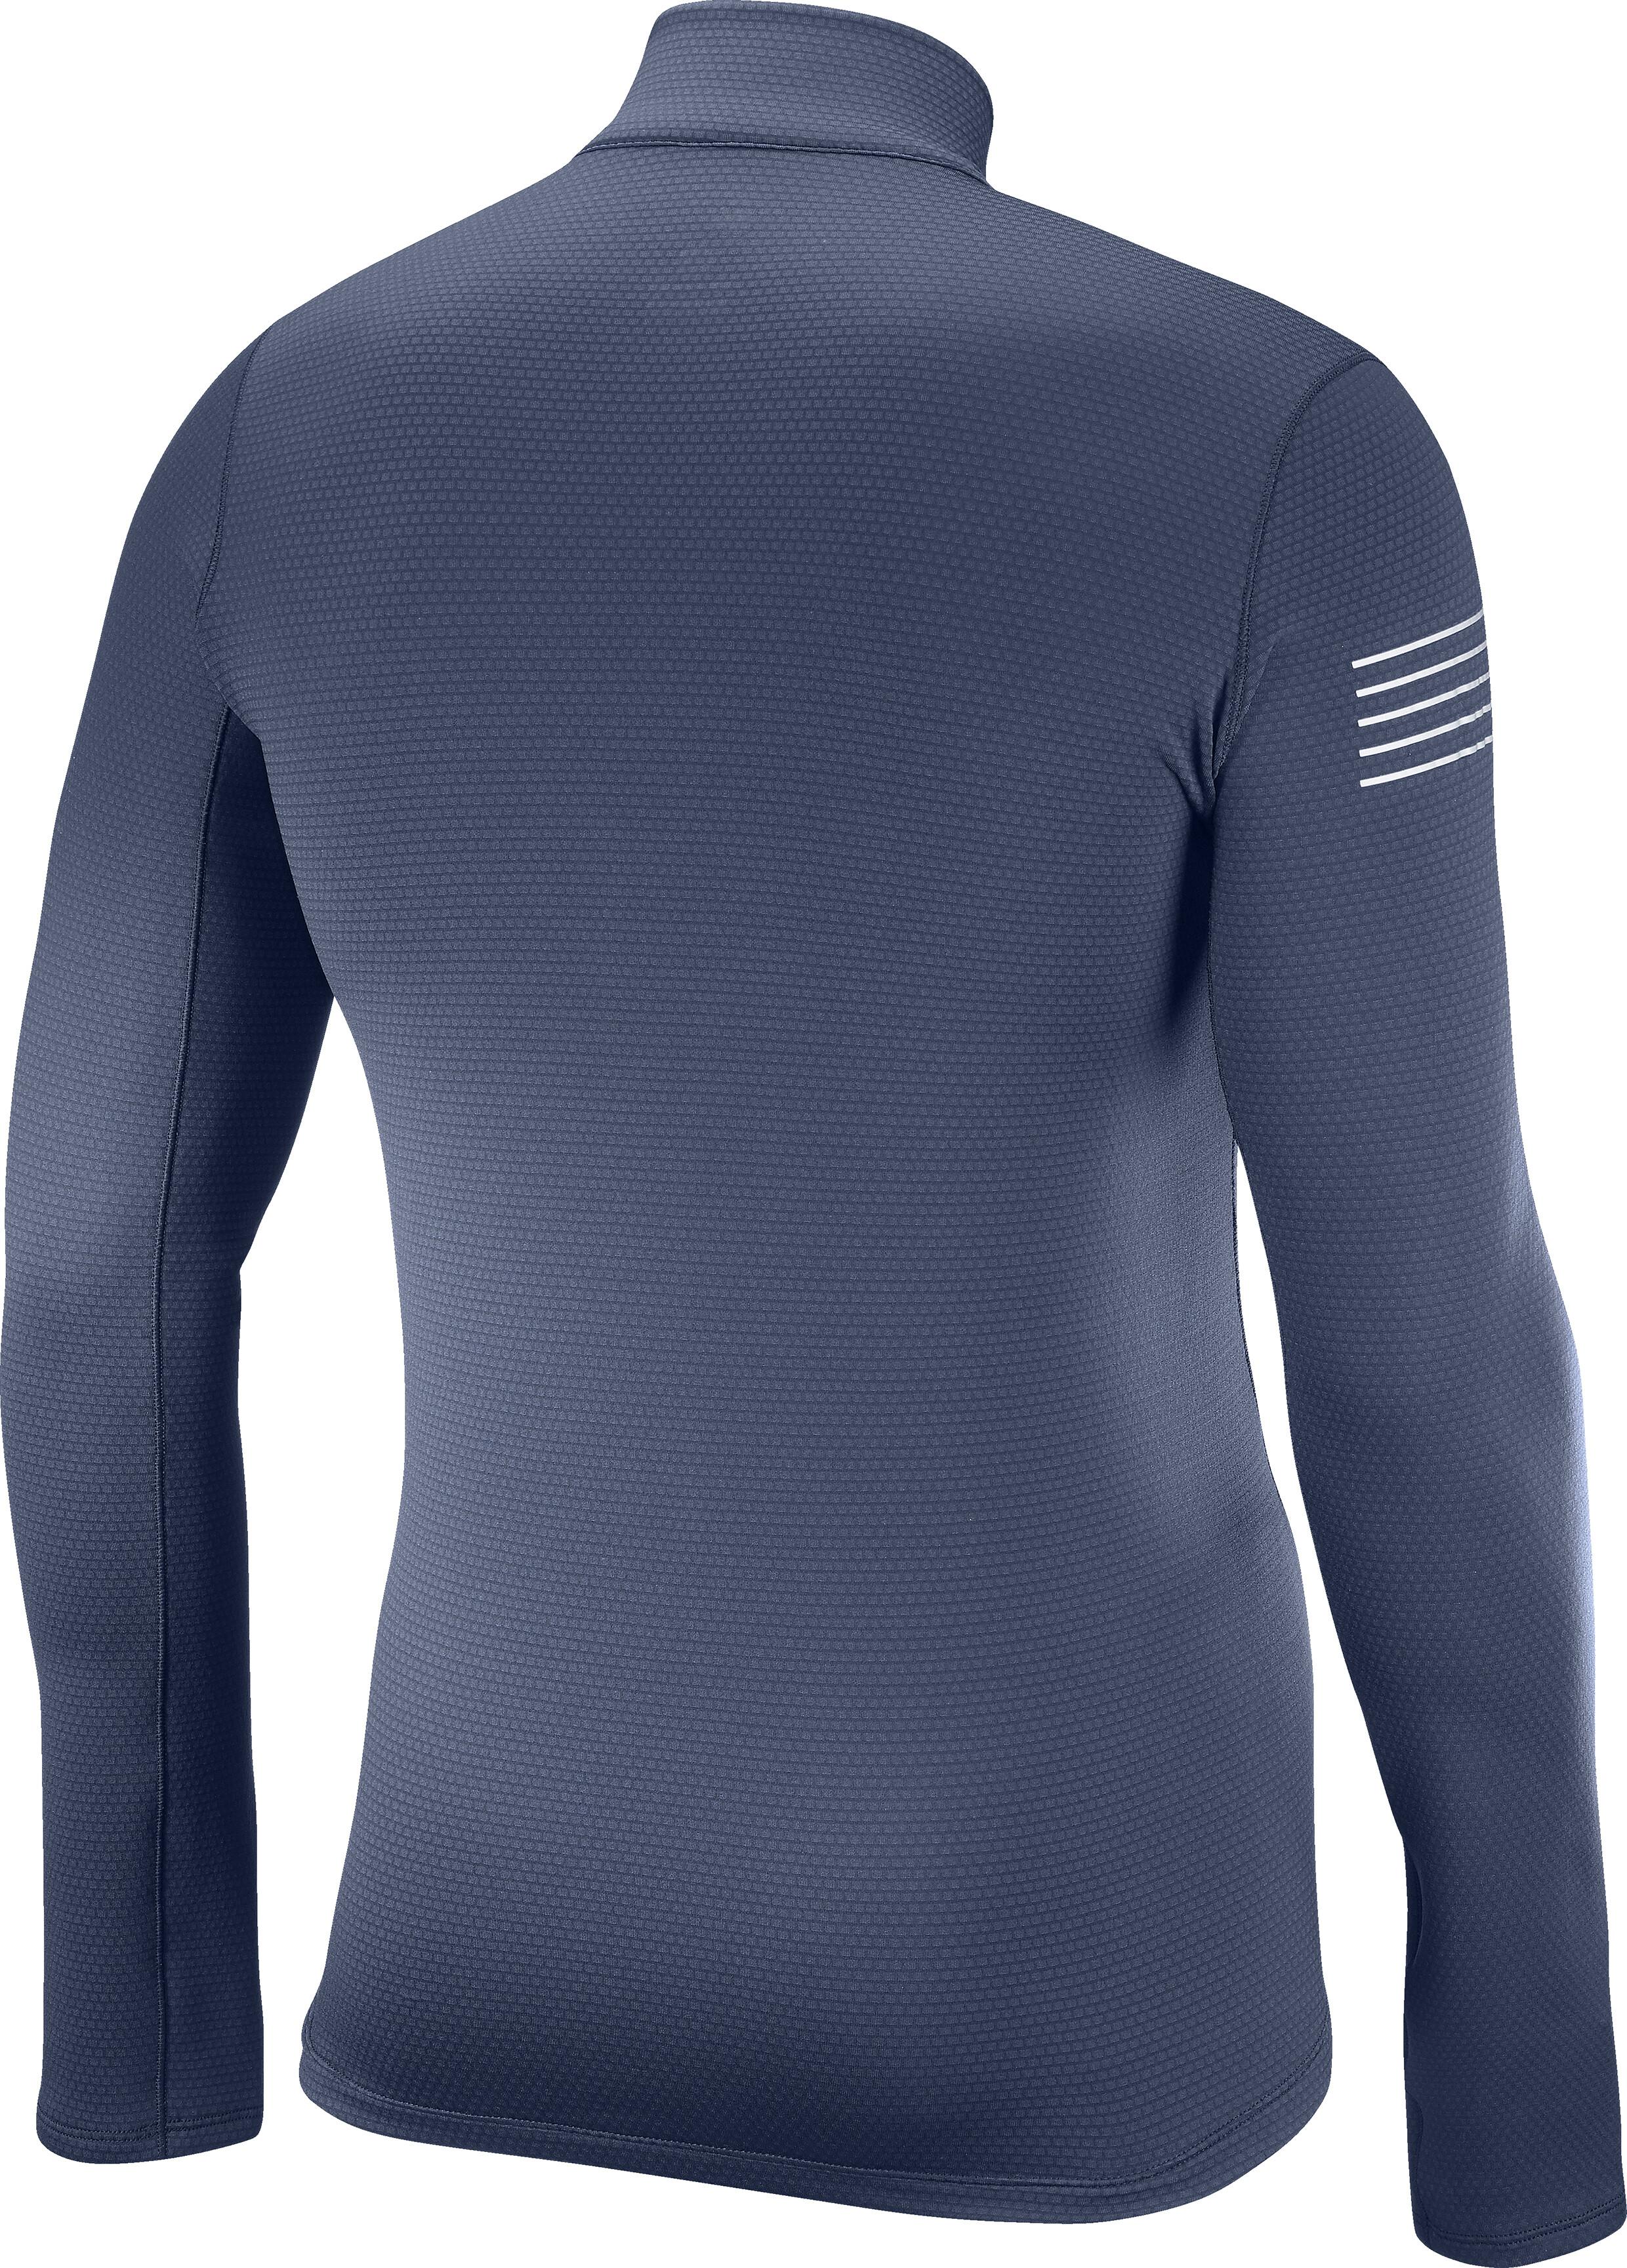 070180e0f2590 Salomon Fast Wing - Camiseta manga larga running Hombre - gris ...